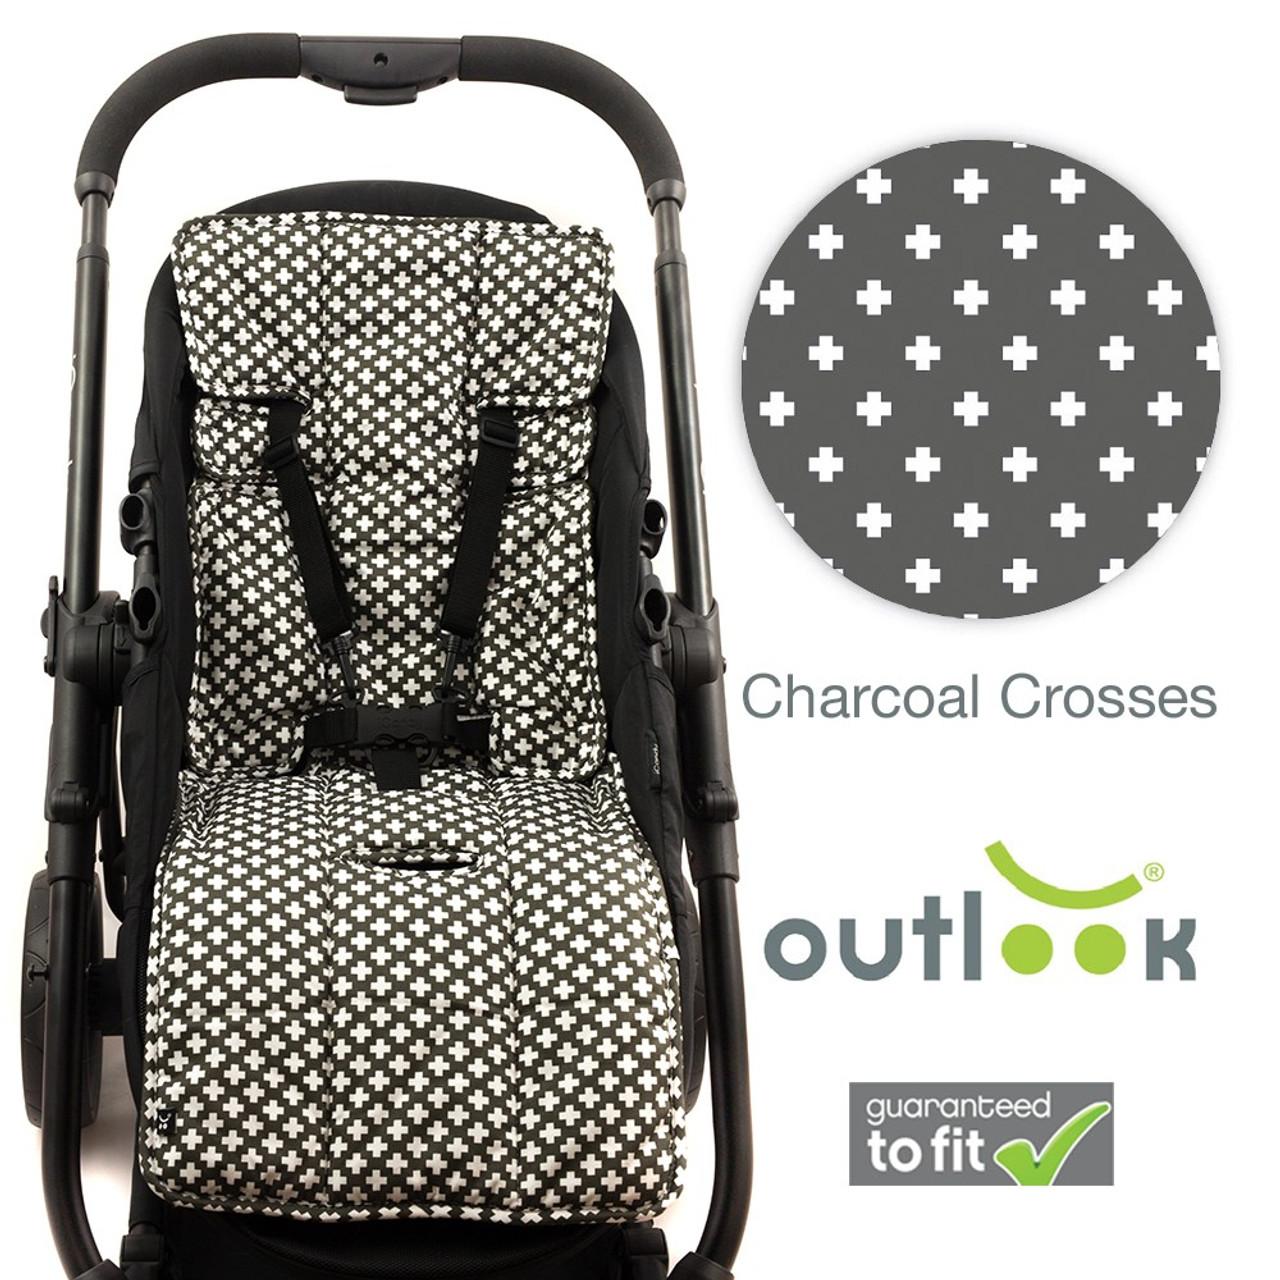 Outlook - 100% Cotton Pram Liner - Charcoal Crosses